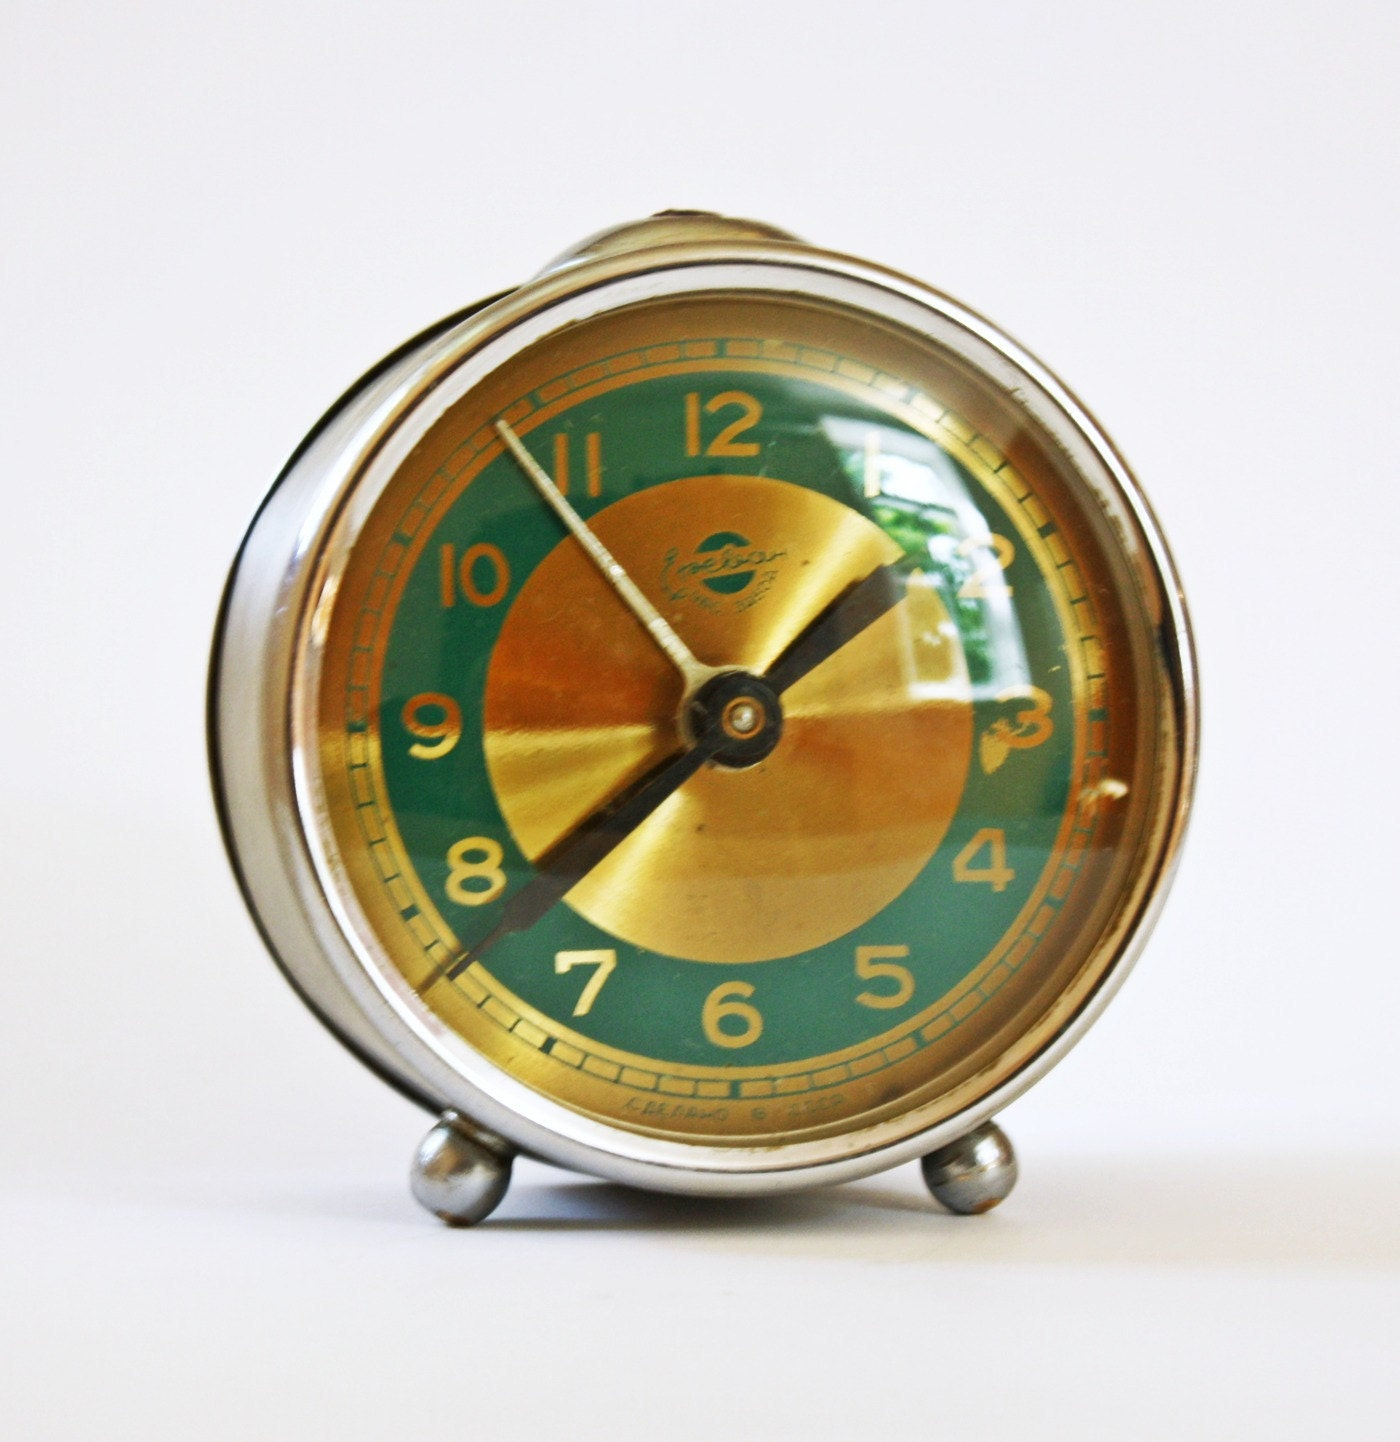 RESERVED RARE Vintage alarm clock Sevani from Armenia metal